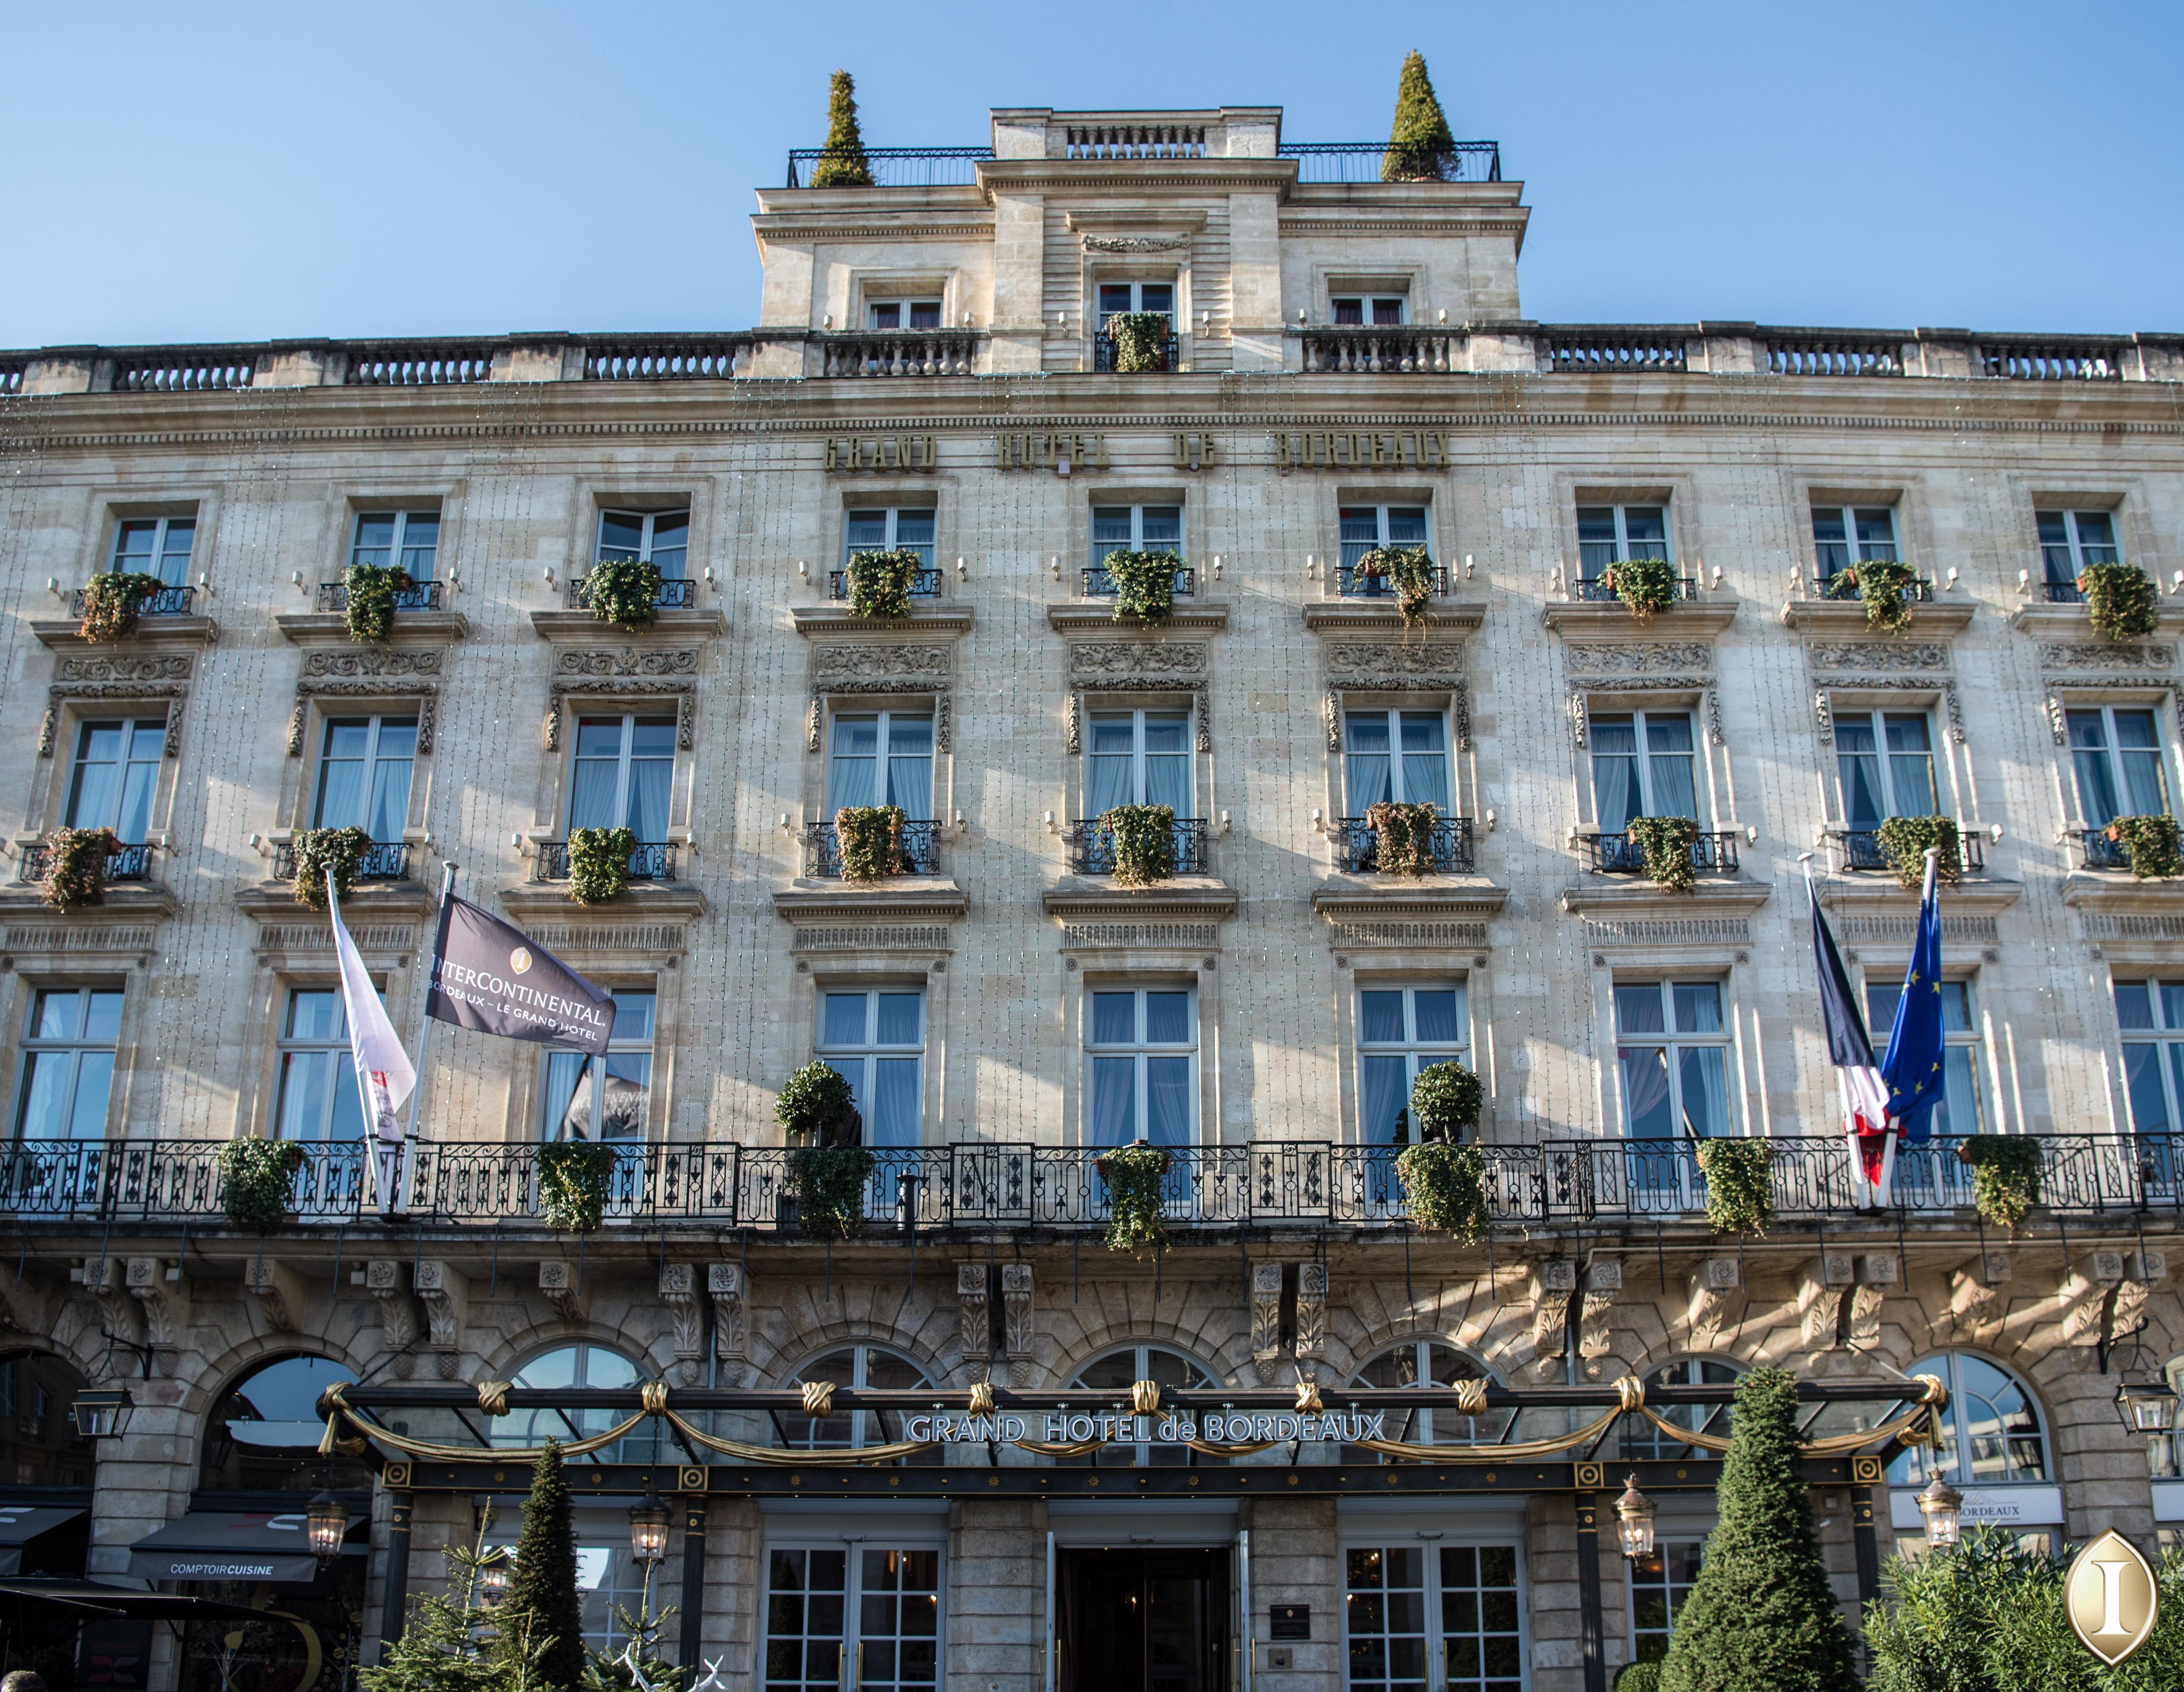 Intercontinental Le grand Hotel Bordeaux